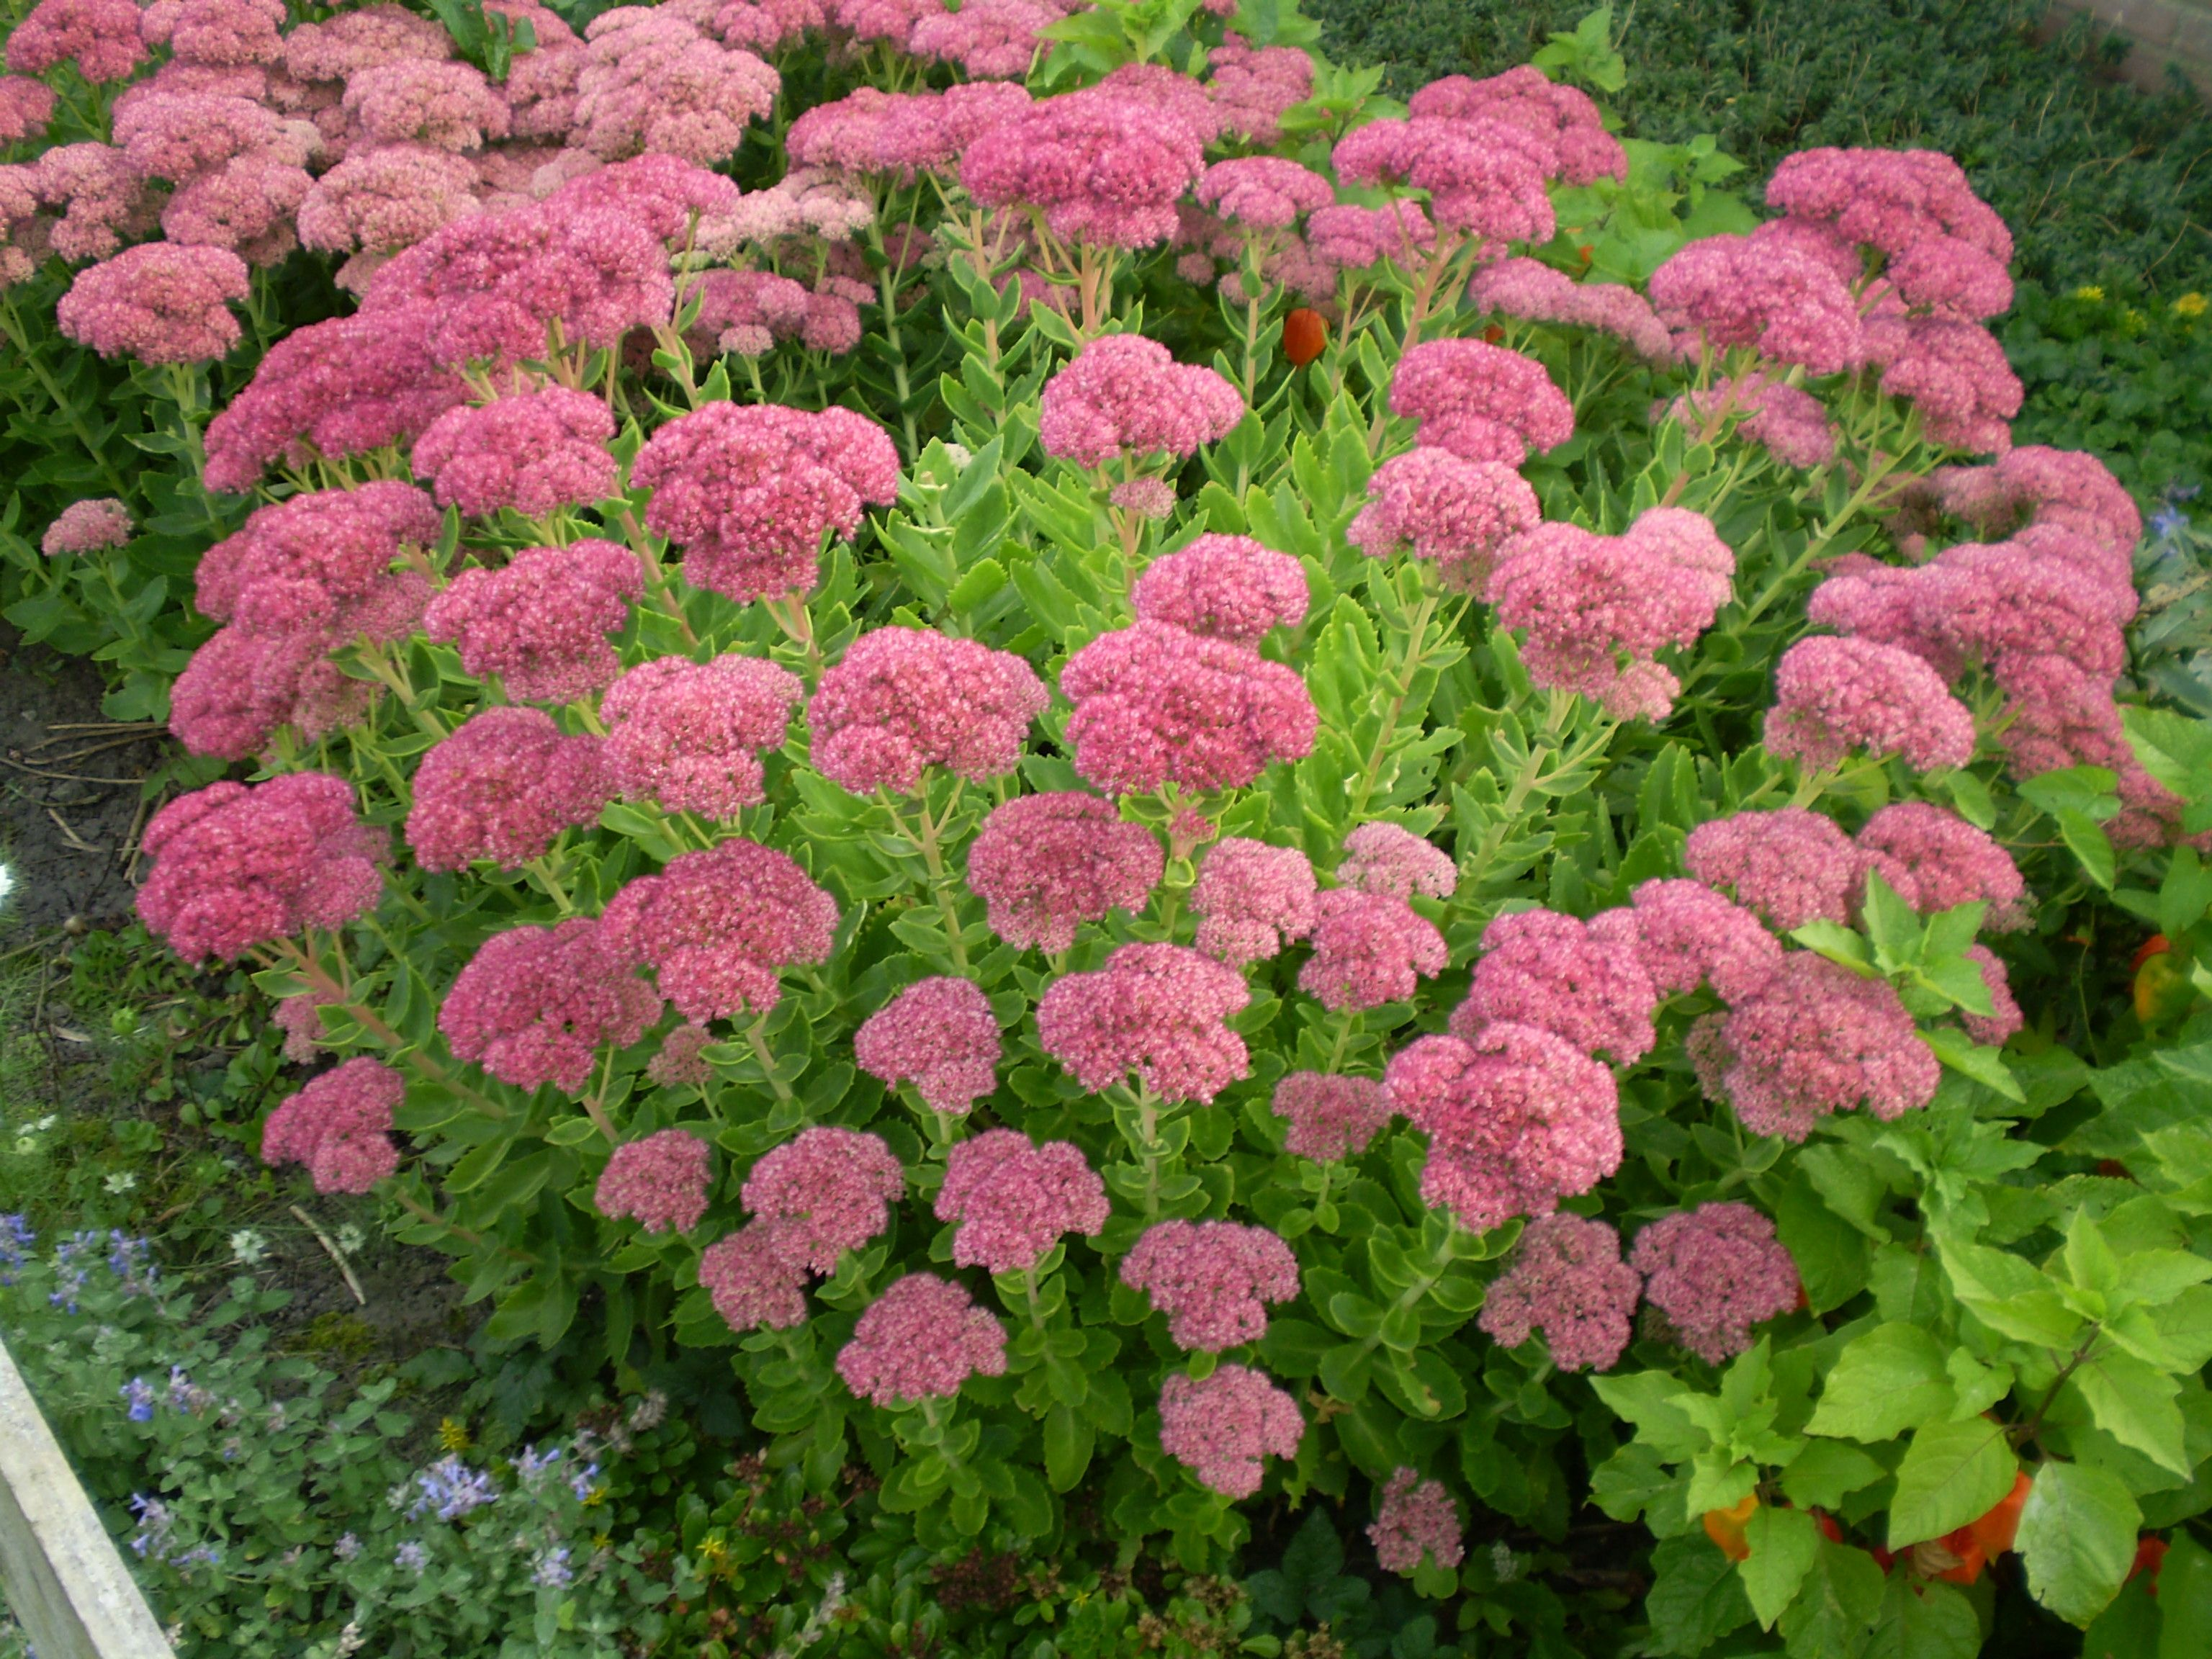 SEDUM spectabile 'Brillant' - Kinesisk Sankthansurt, farve: rosa, lysforhold: sol, højde: 30 cm, blomstring: august - oktober, velegnet til snit, god til bier og andre insekter.